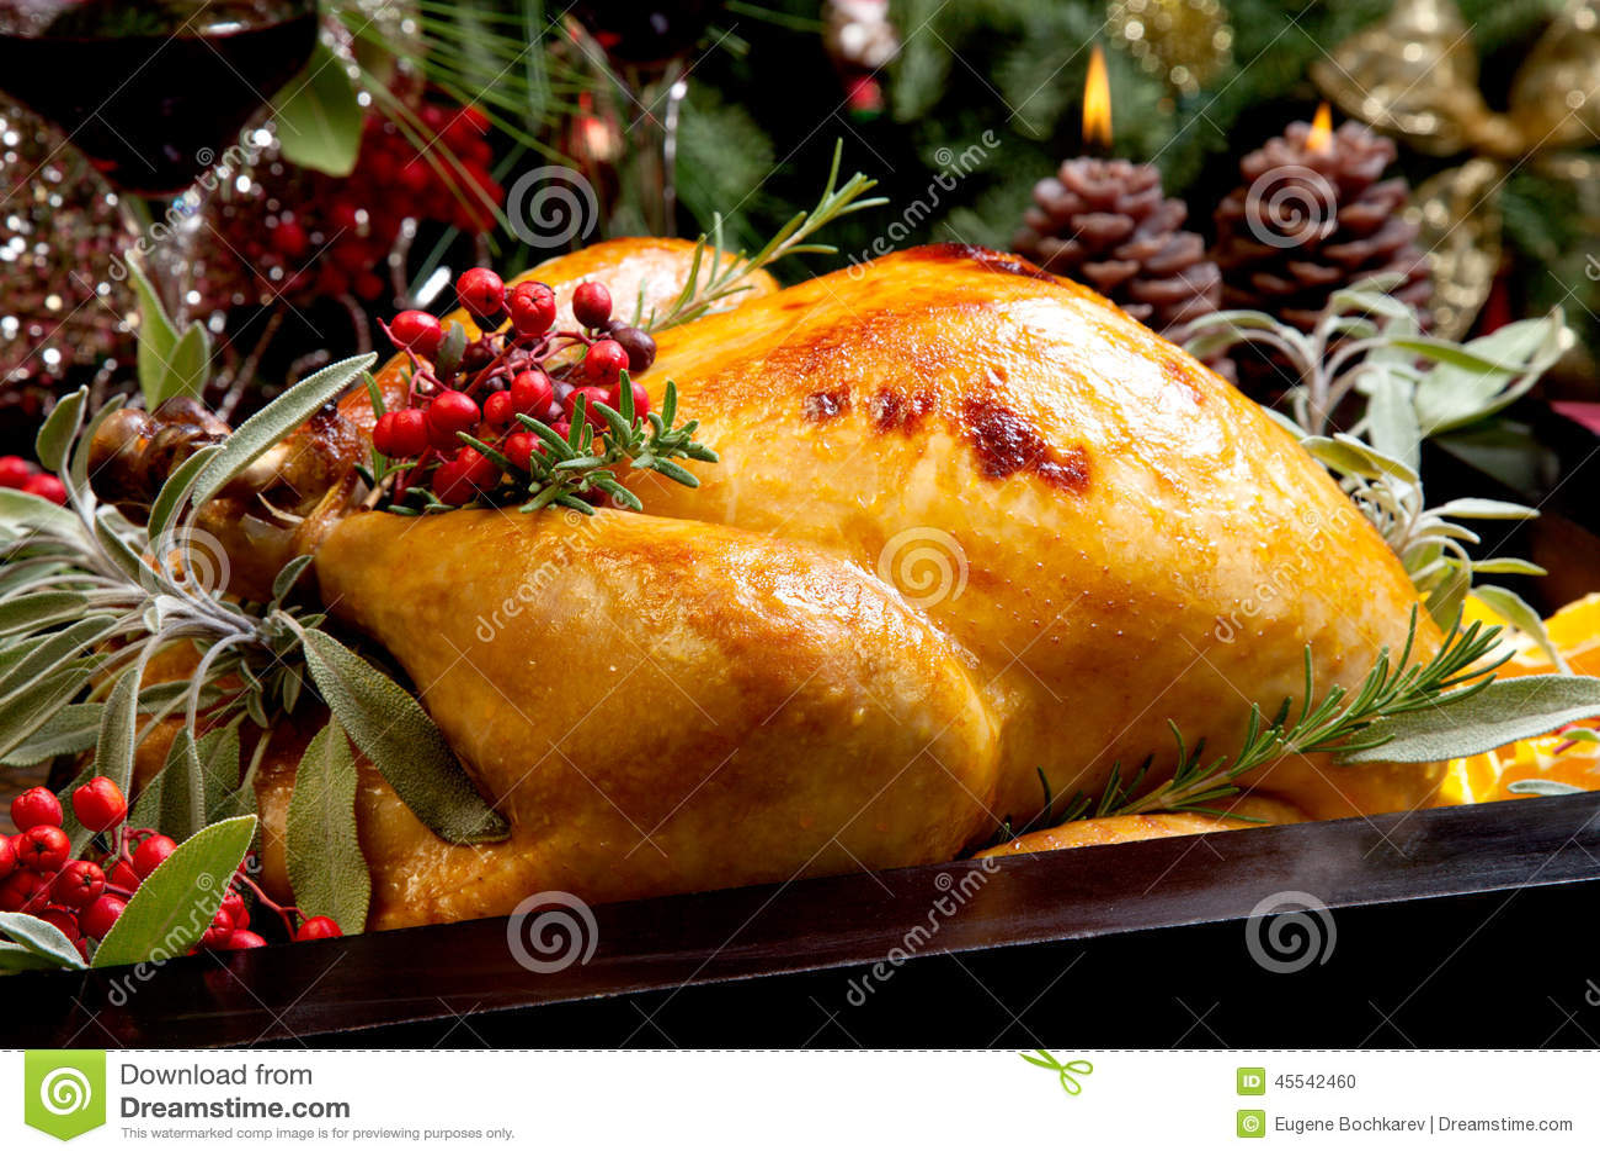 Christmas Turkey Prepared For Dinner Stock Photo - Image: 45542460